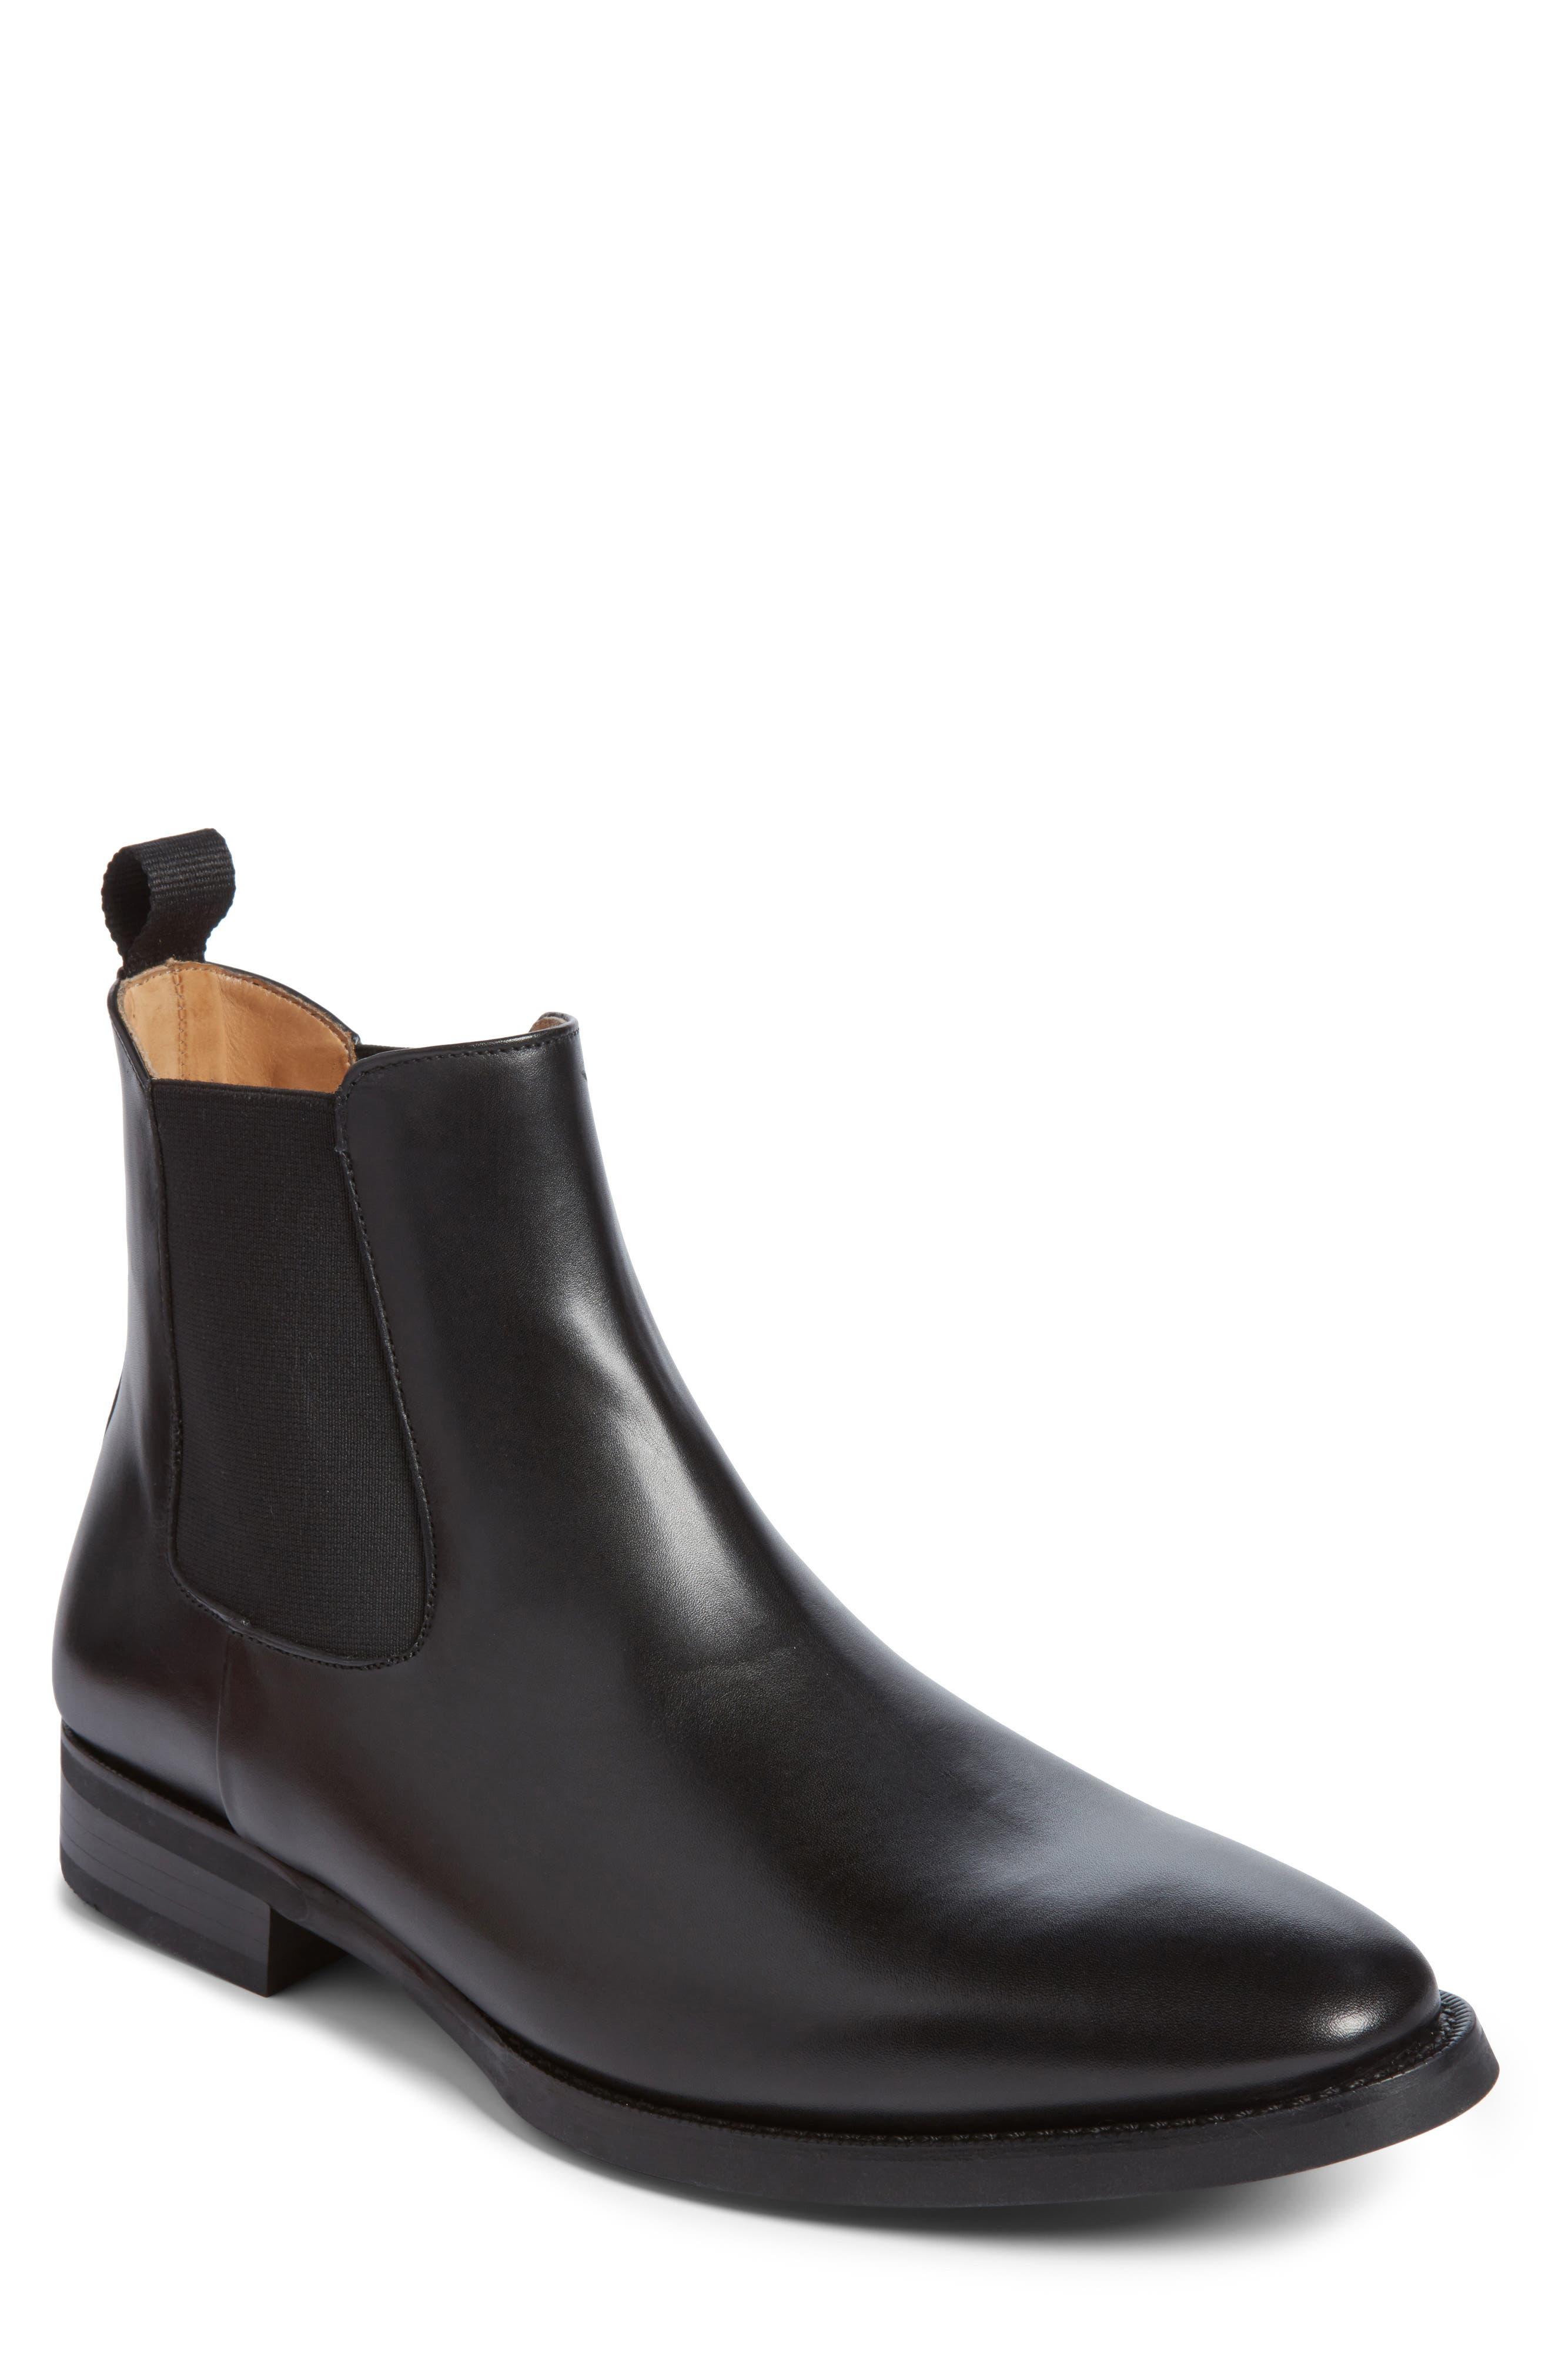 JACK ERWIN, Ellis Water Resistant Chelsea Boot, Main thumbnail 1, color, BLACK LEATHER